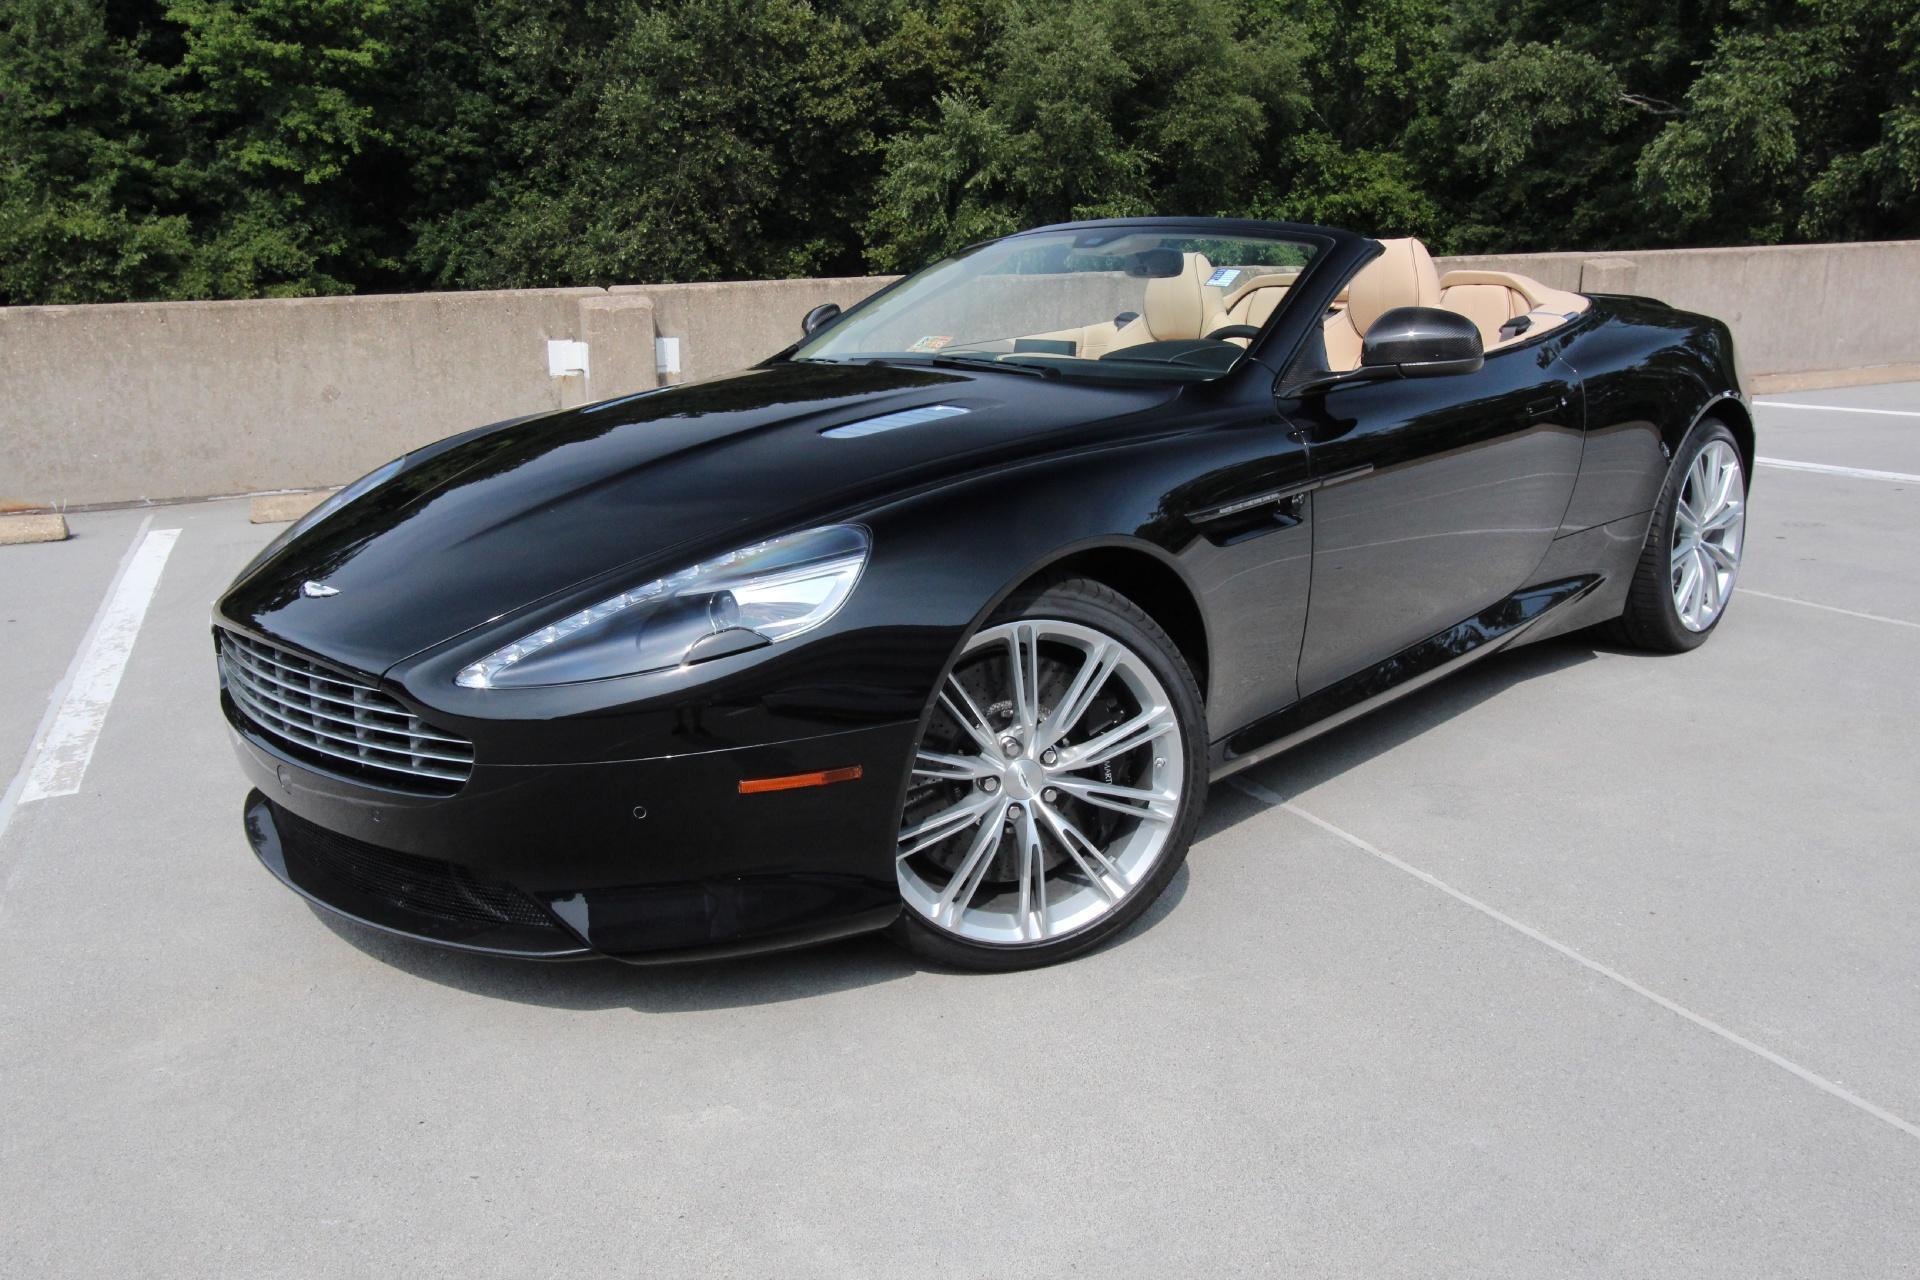 2015 Aston Martin Db9 Volante Carbon Edition Stock 5nb16222 For Sale Near Vienna Va Va Aston Martin Dealer